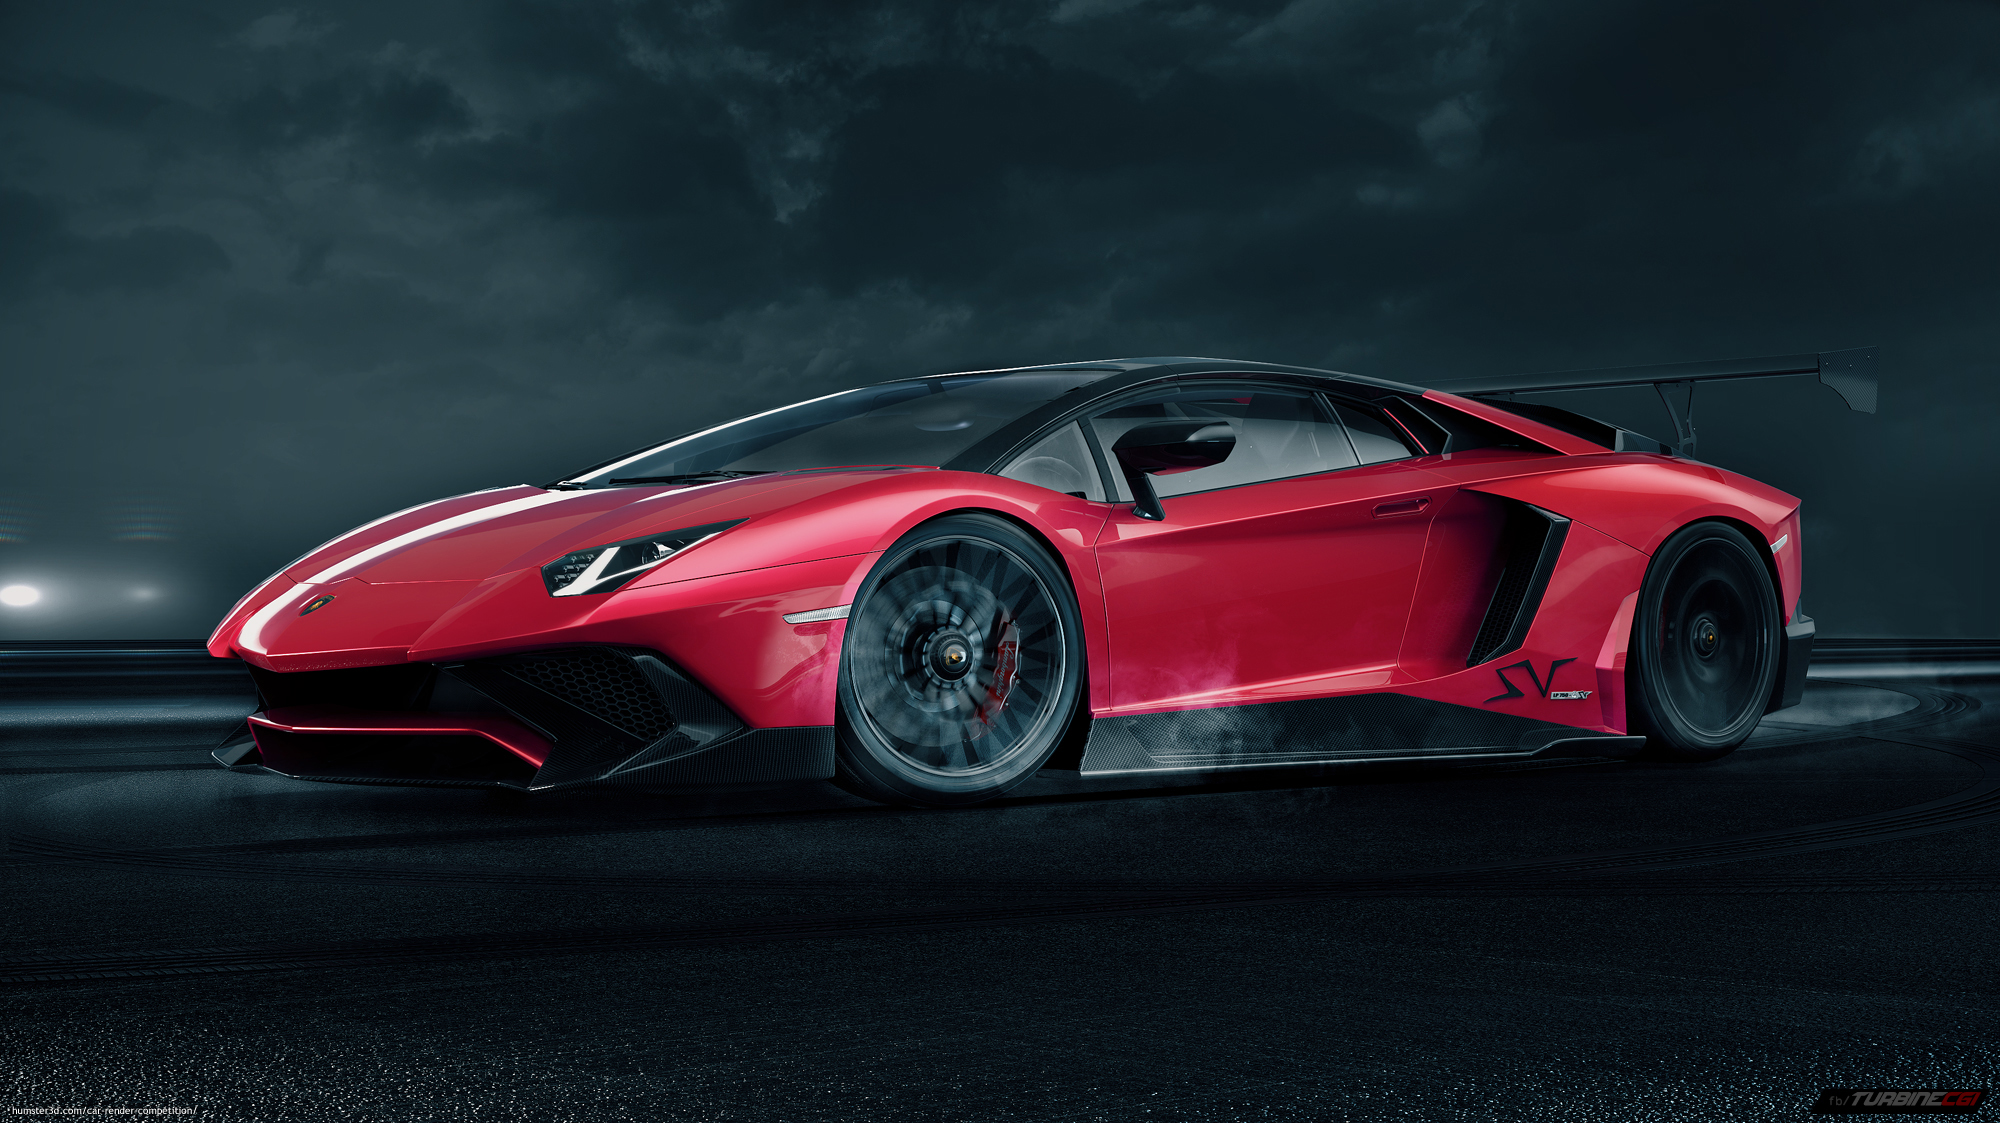 Lamborghini Aventador SV 3d art